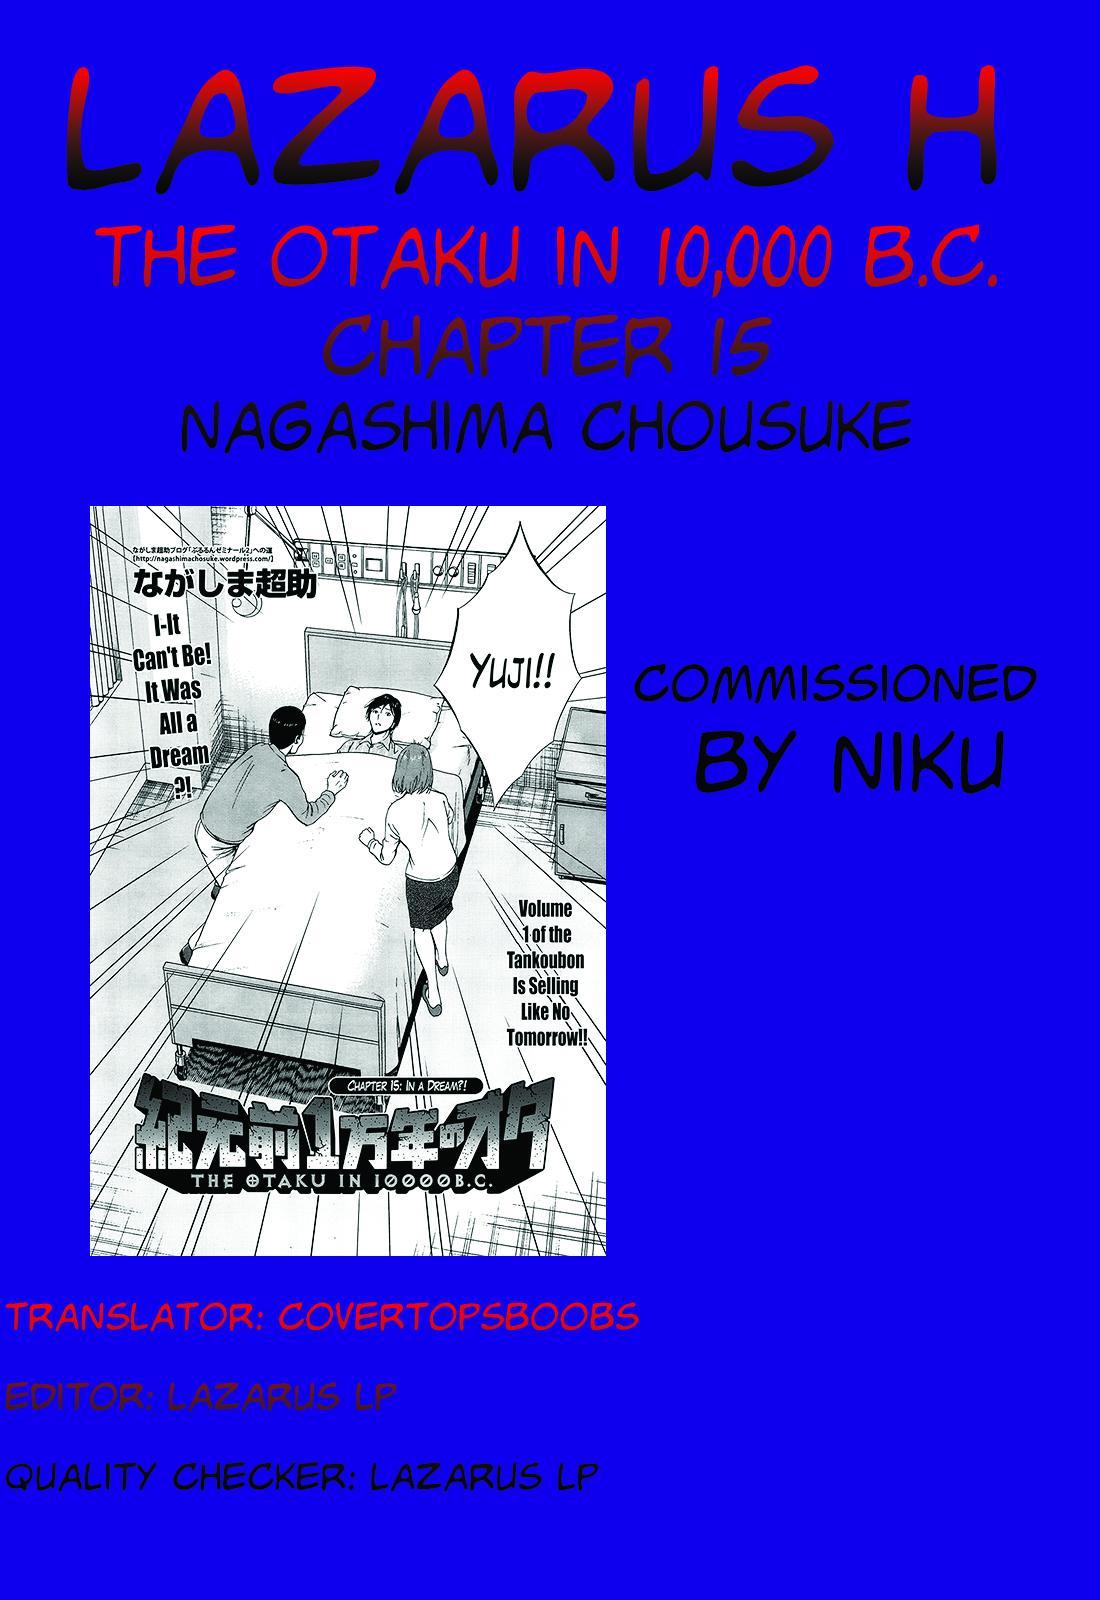 Kigenzen 10000 Nen no Ota | The Otaku in 10,000 B.C. 289